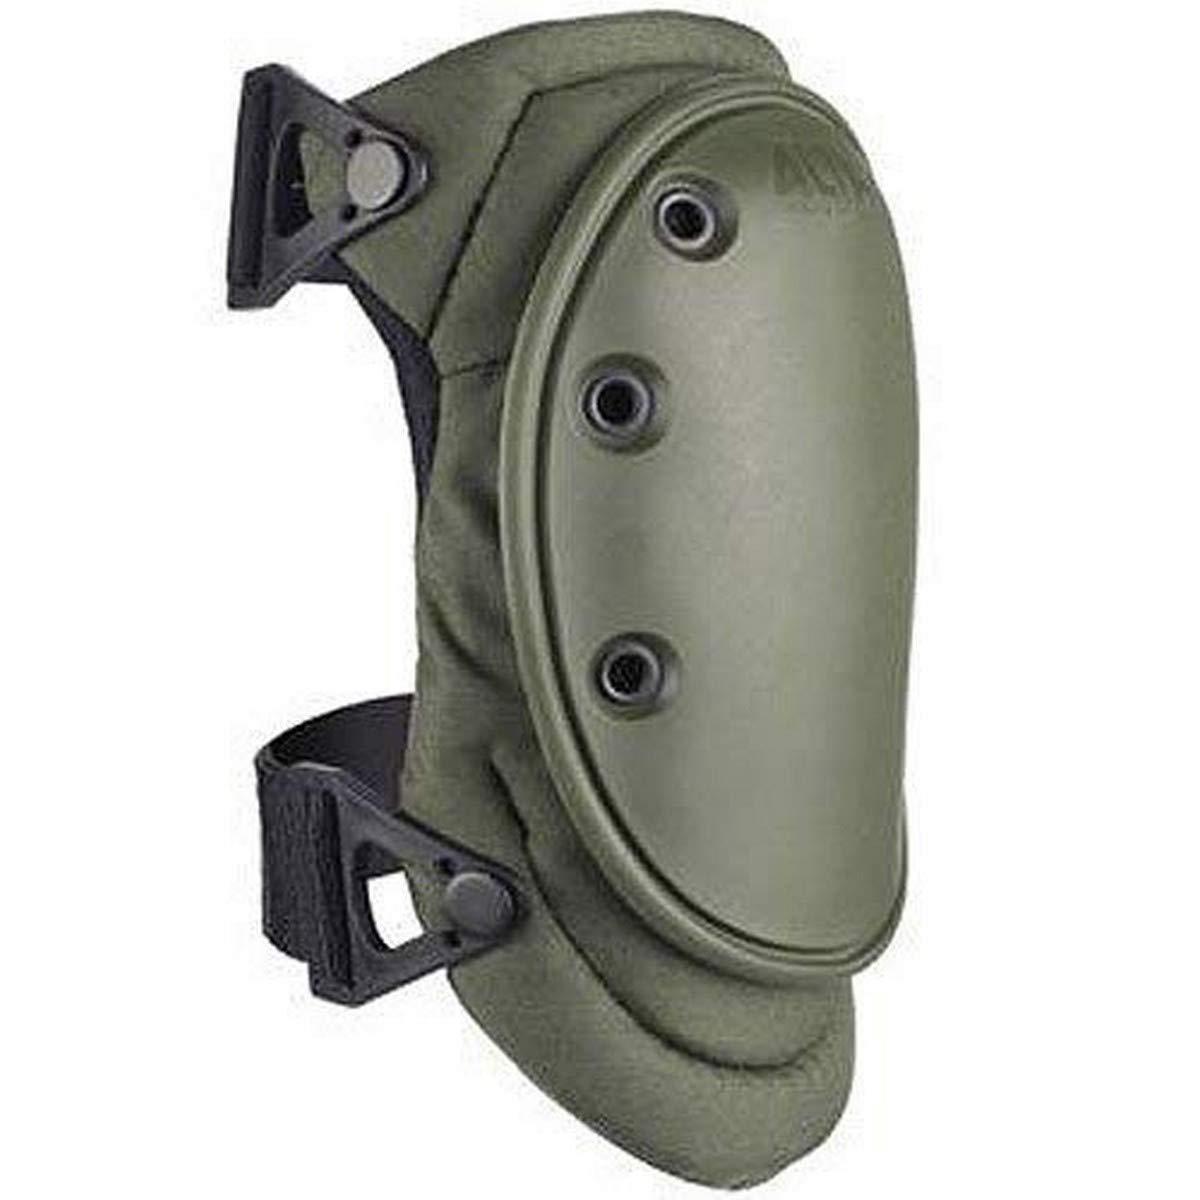 ALTA 50413.09 AltaFLEX Max 49% 70% OFF Outlet OFF Knee Protector Olive Pad Cordura N Green